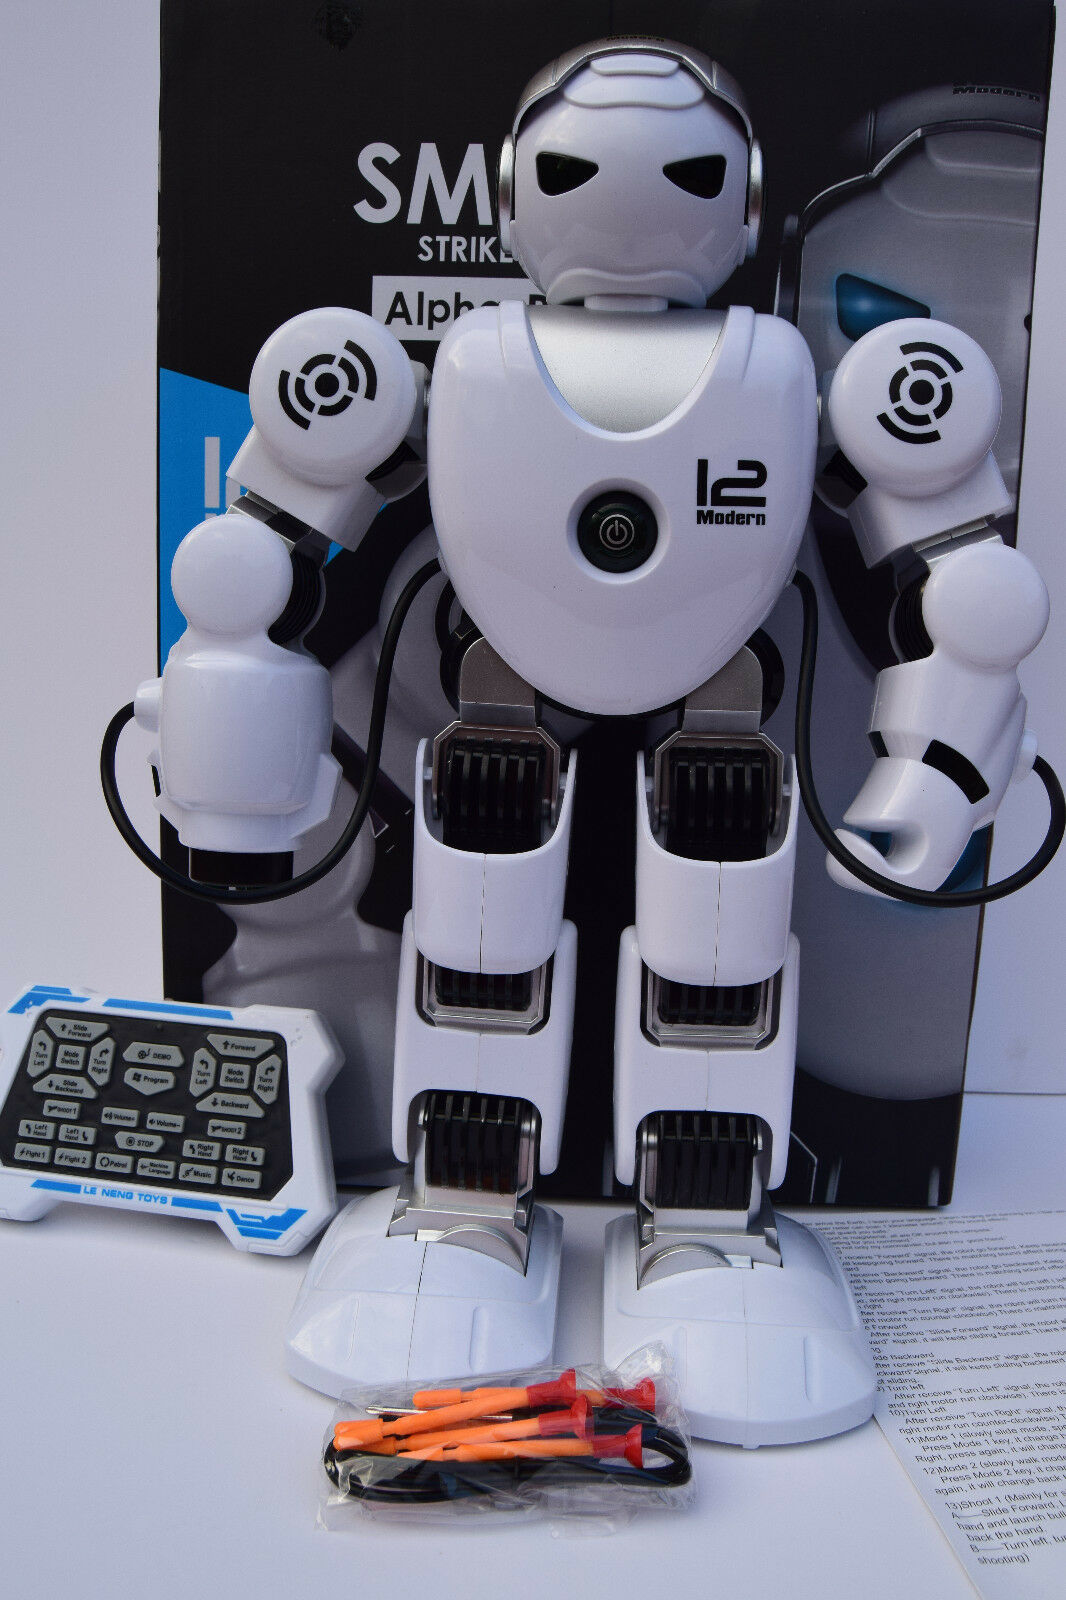 SMART STRIKE ROBOT SHOOTS FIRES MISSLE WALKS SLIDES DANCES REMOTE CONTROL